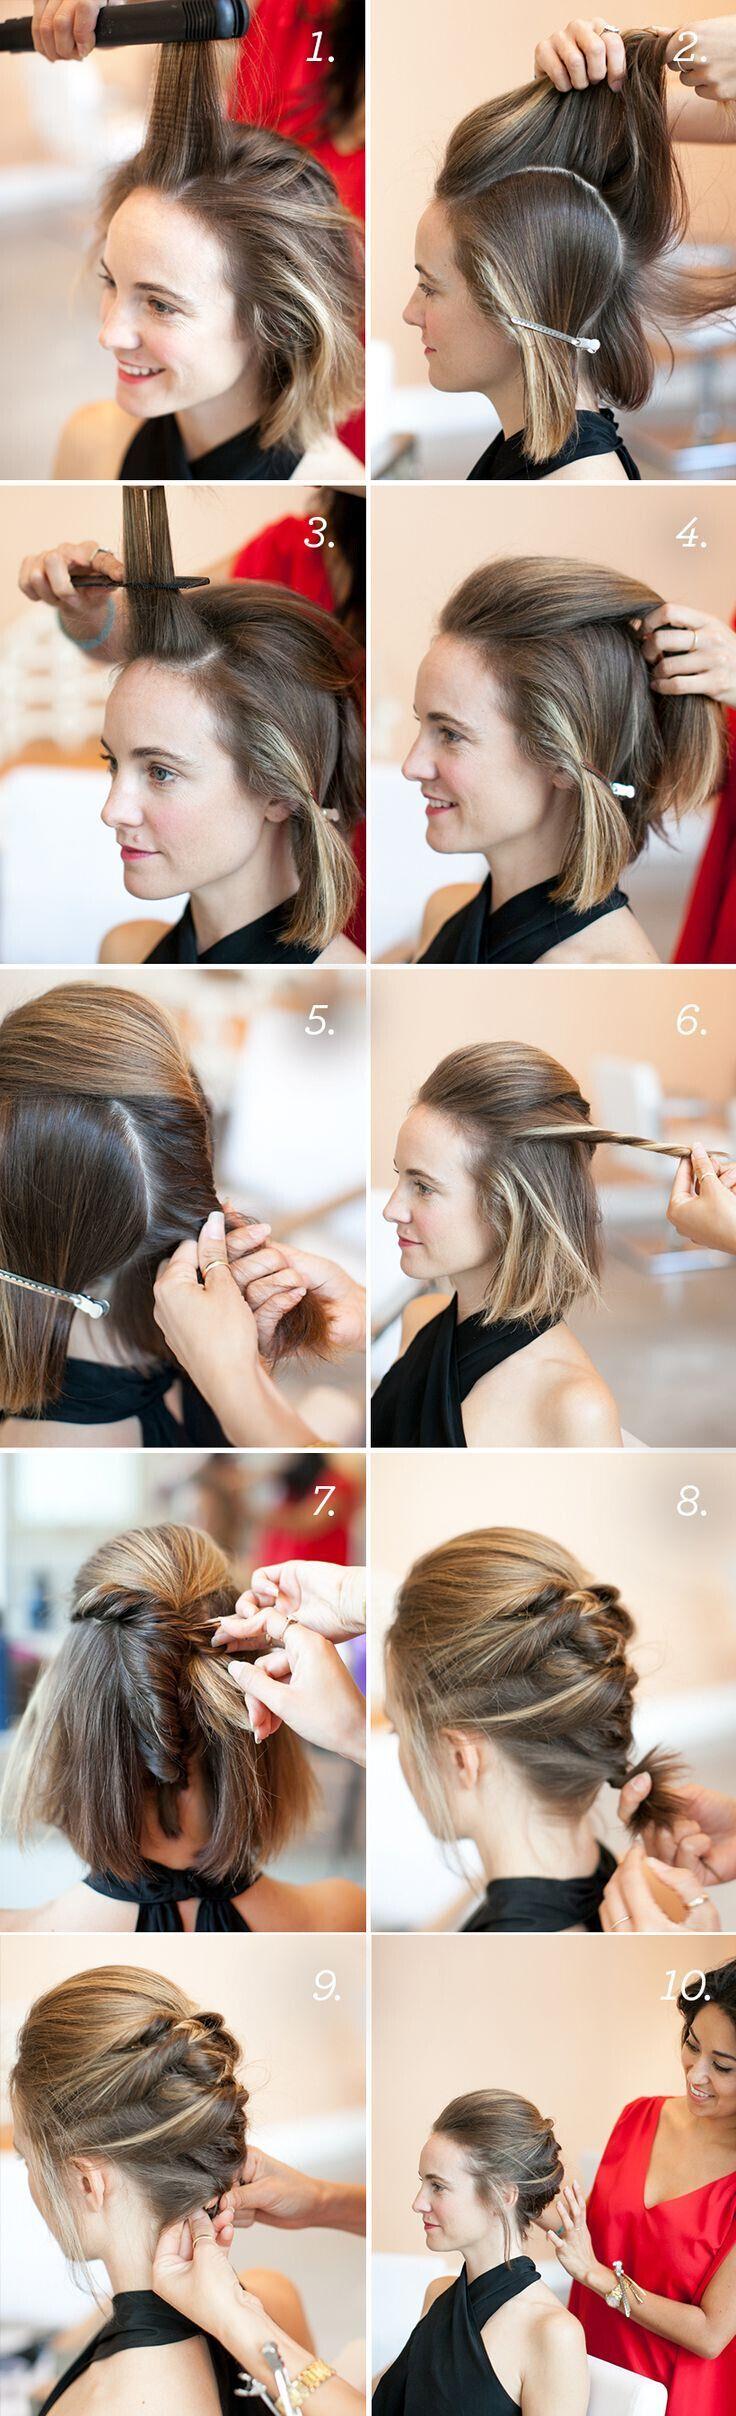 Cool Simple Braided Updos For Short Hair Braids Short Hairstyles For Black Women Fulllsitofus